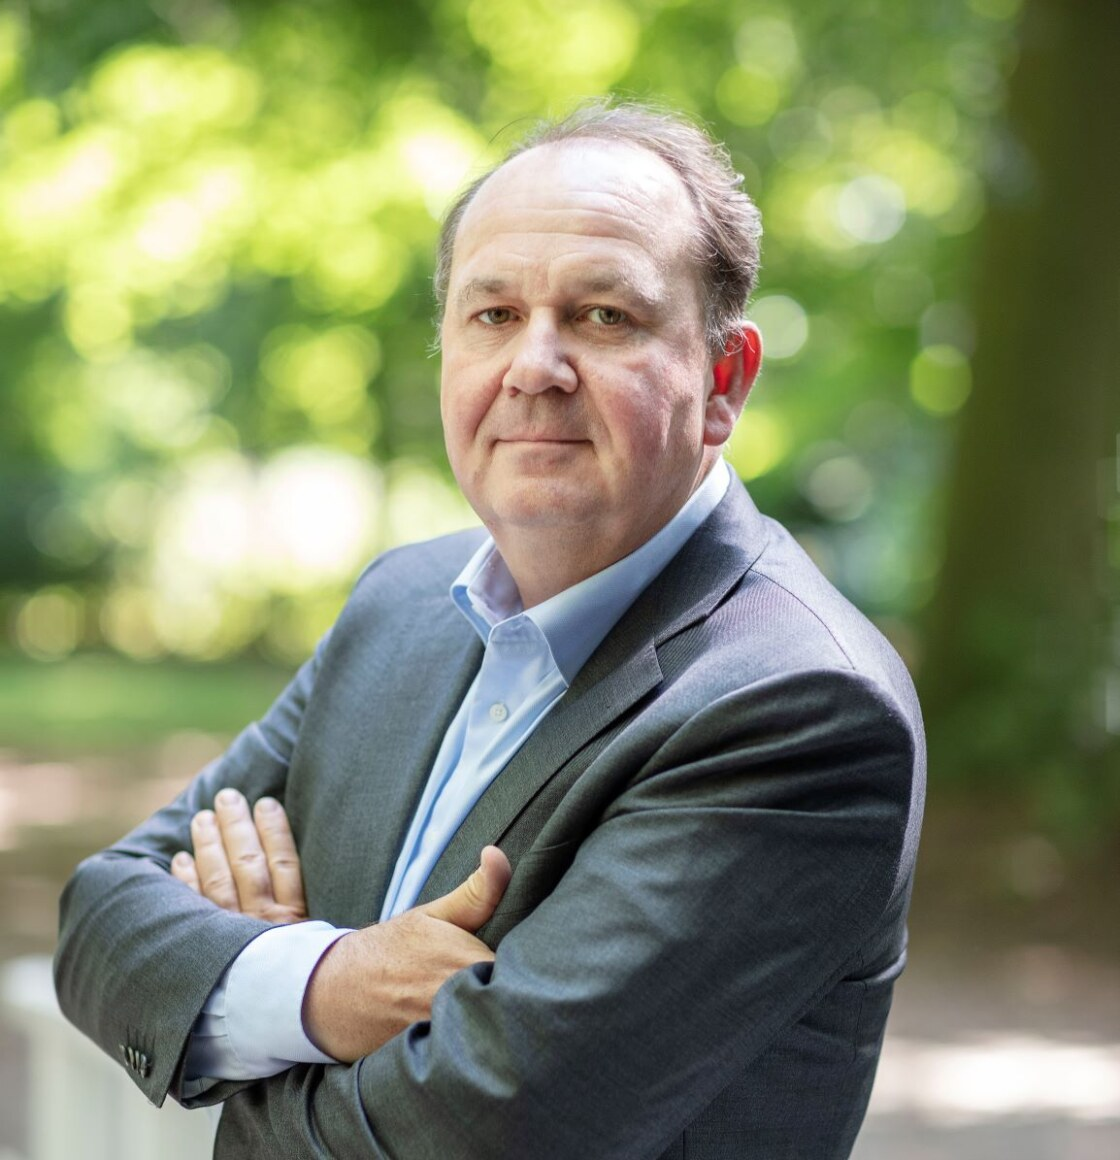 Legaltech foto Jan Padberg m